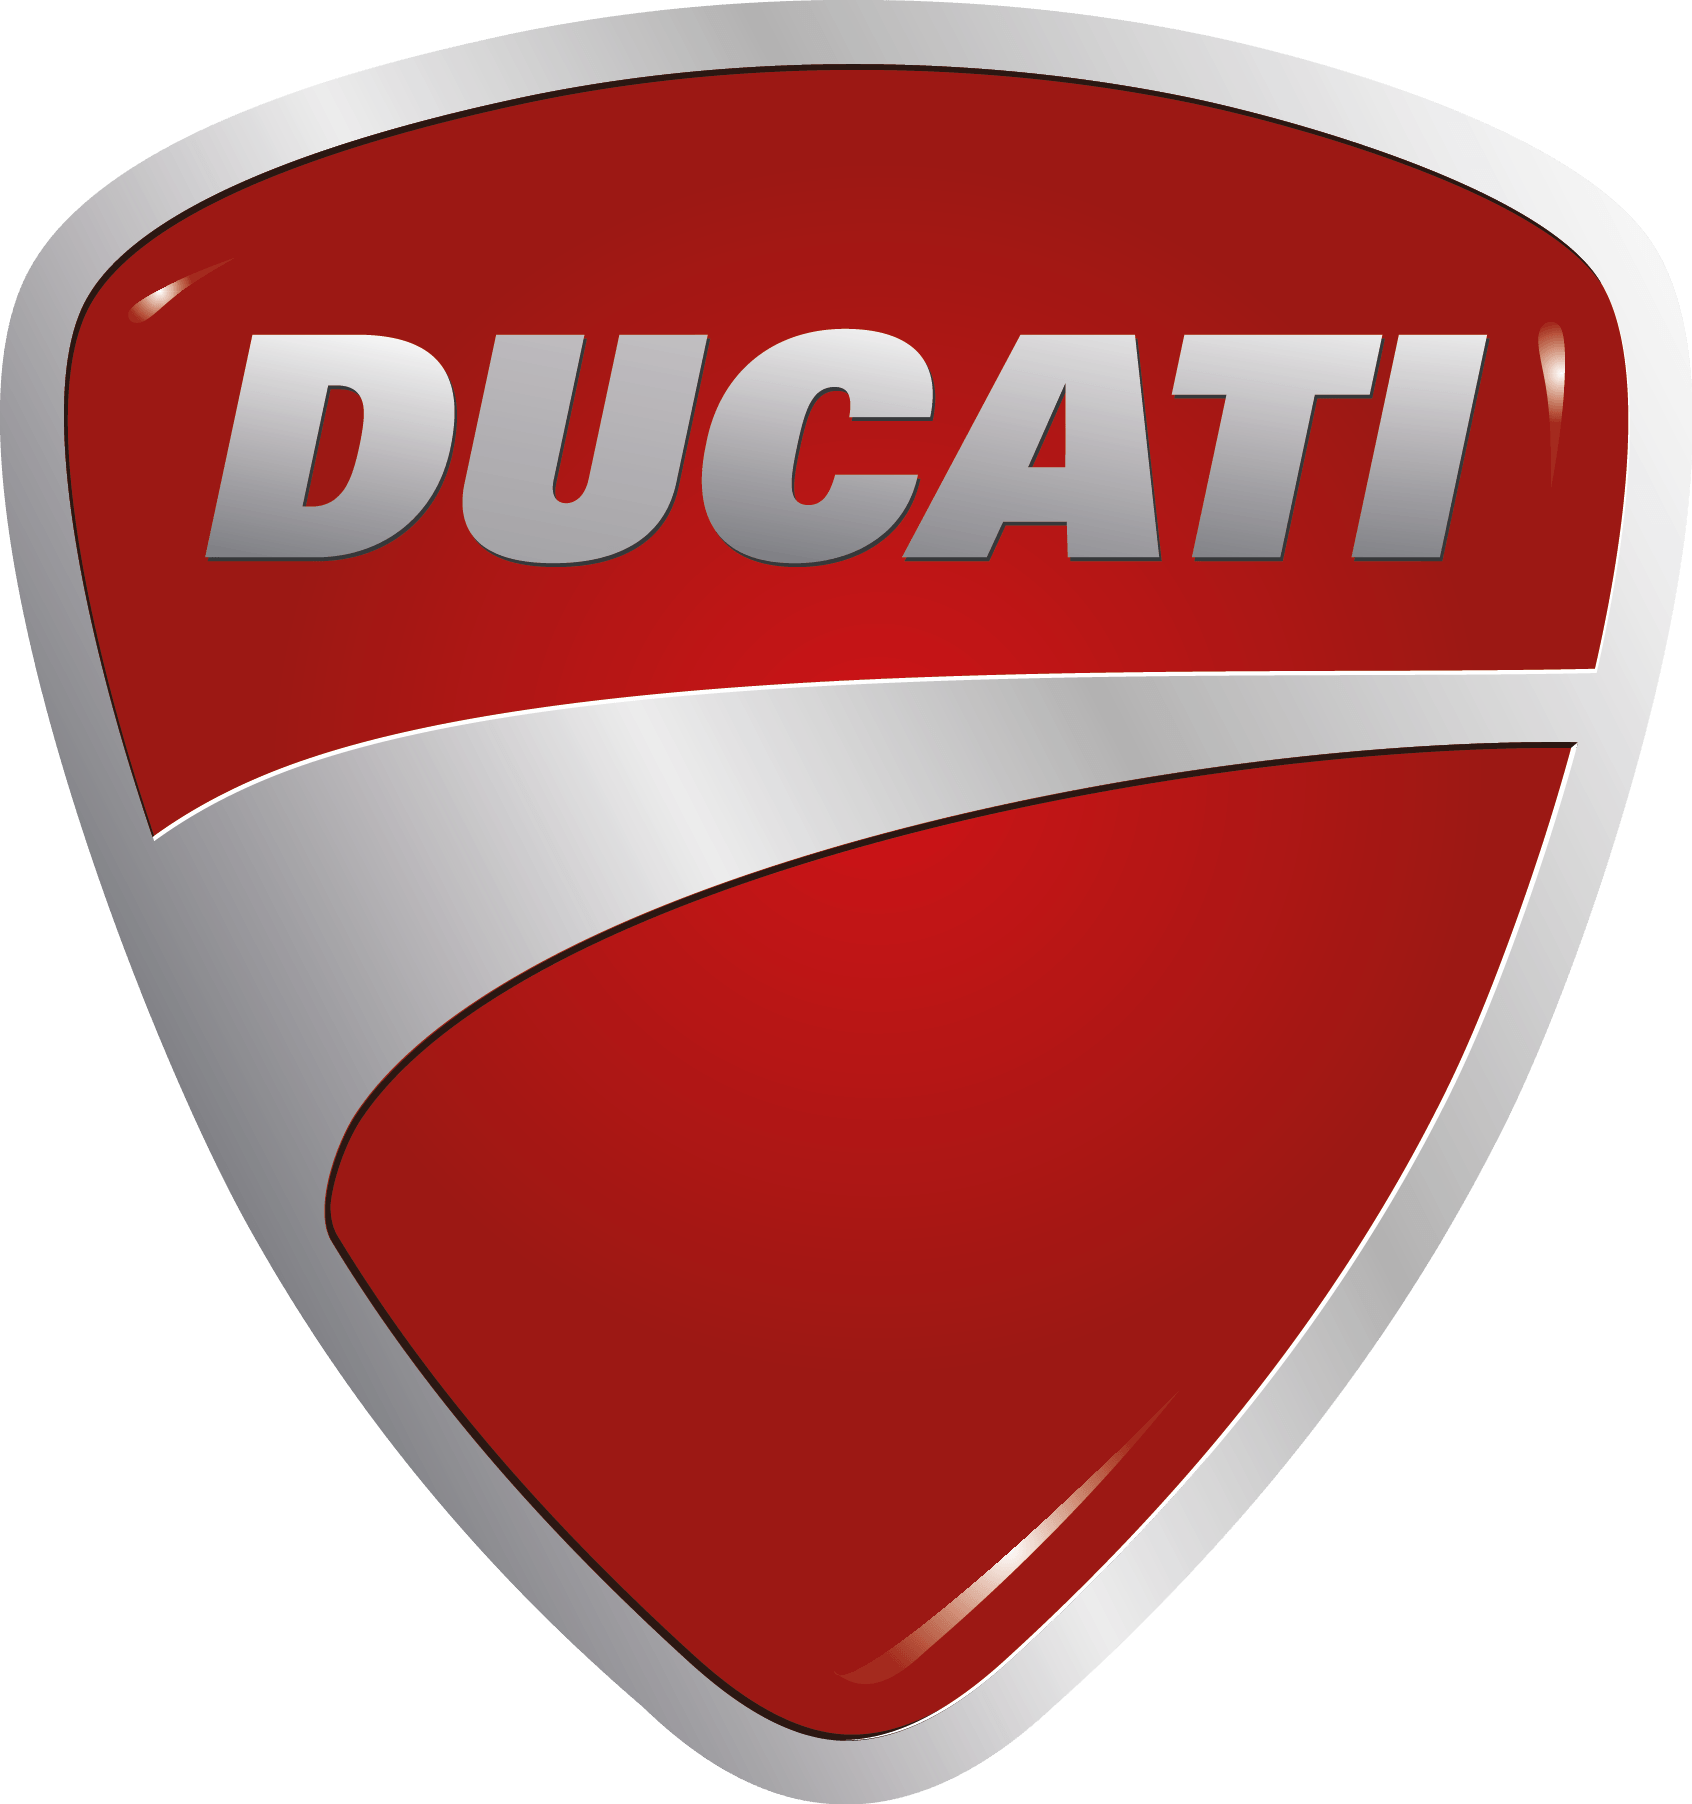 Ducati Logo Download Vector.